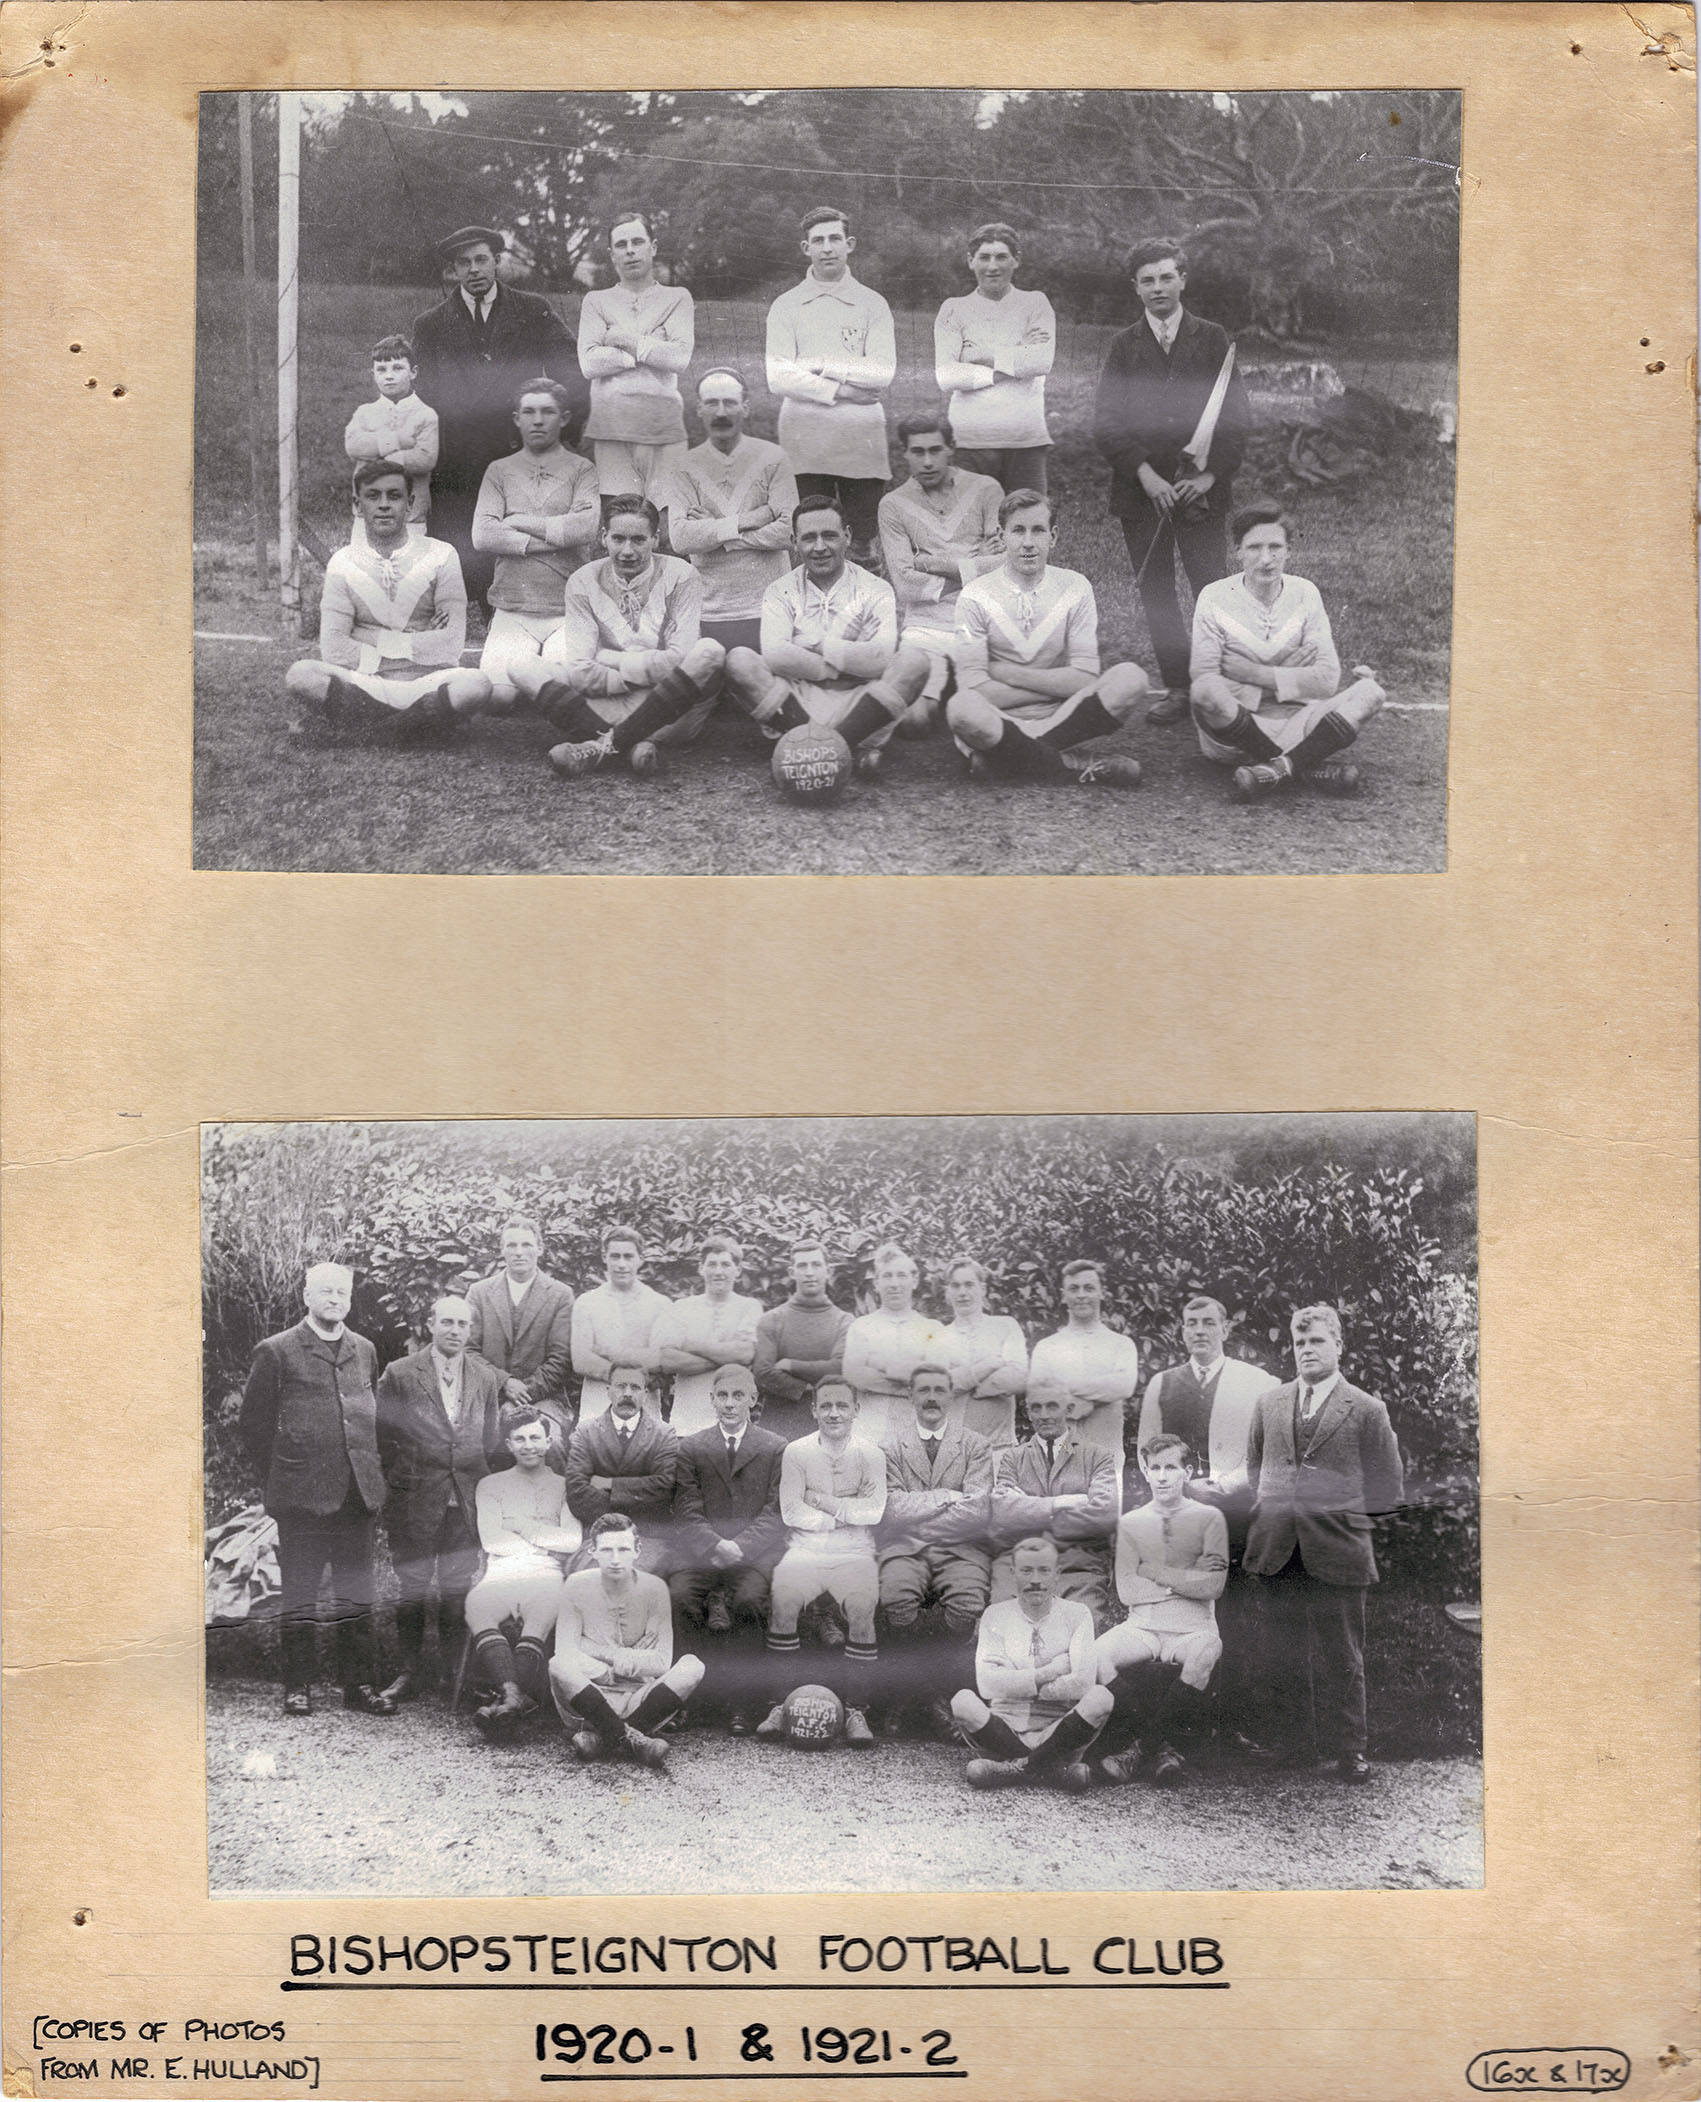 Exhibition board Bishopsteignton Football Club 1920-1 & 1921-2.